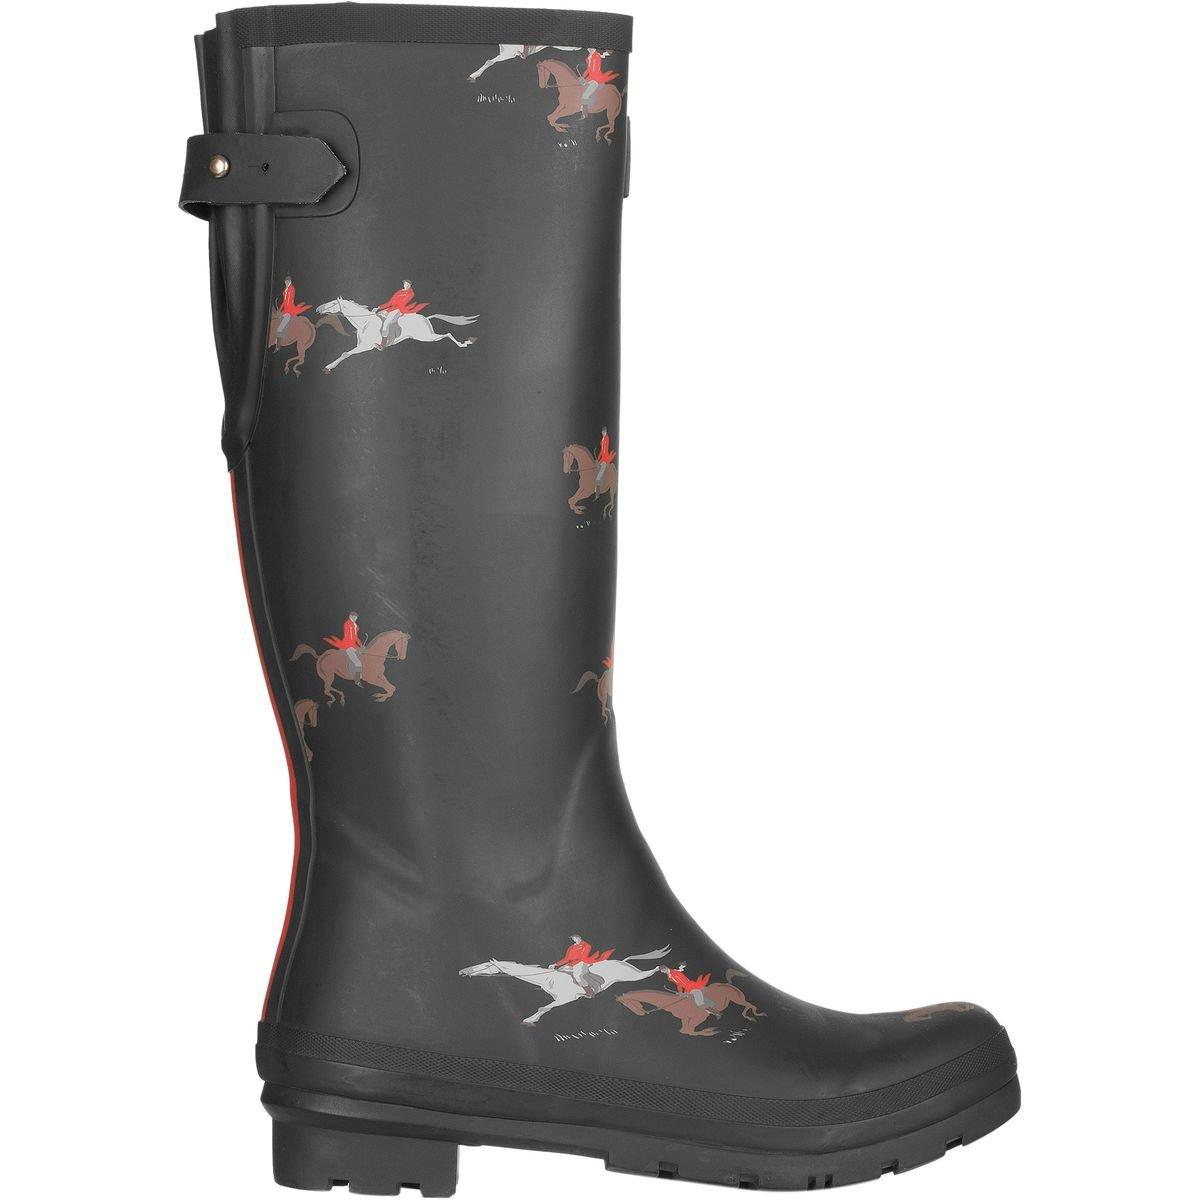 Joules Women's Ajusta Rain Boot B06VV5N76B 9 B(M) US|Olive Horse